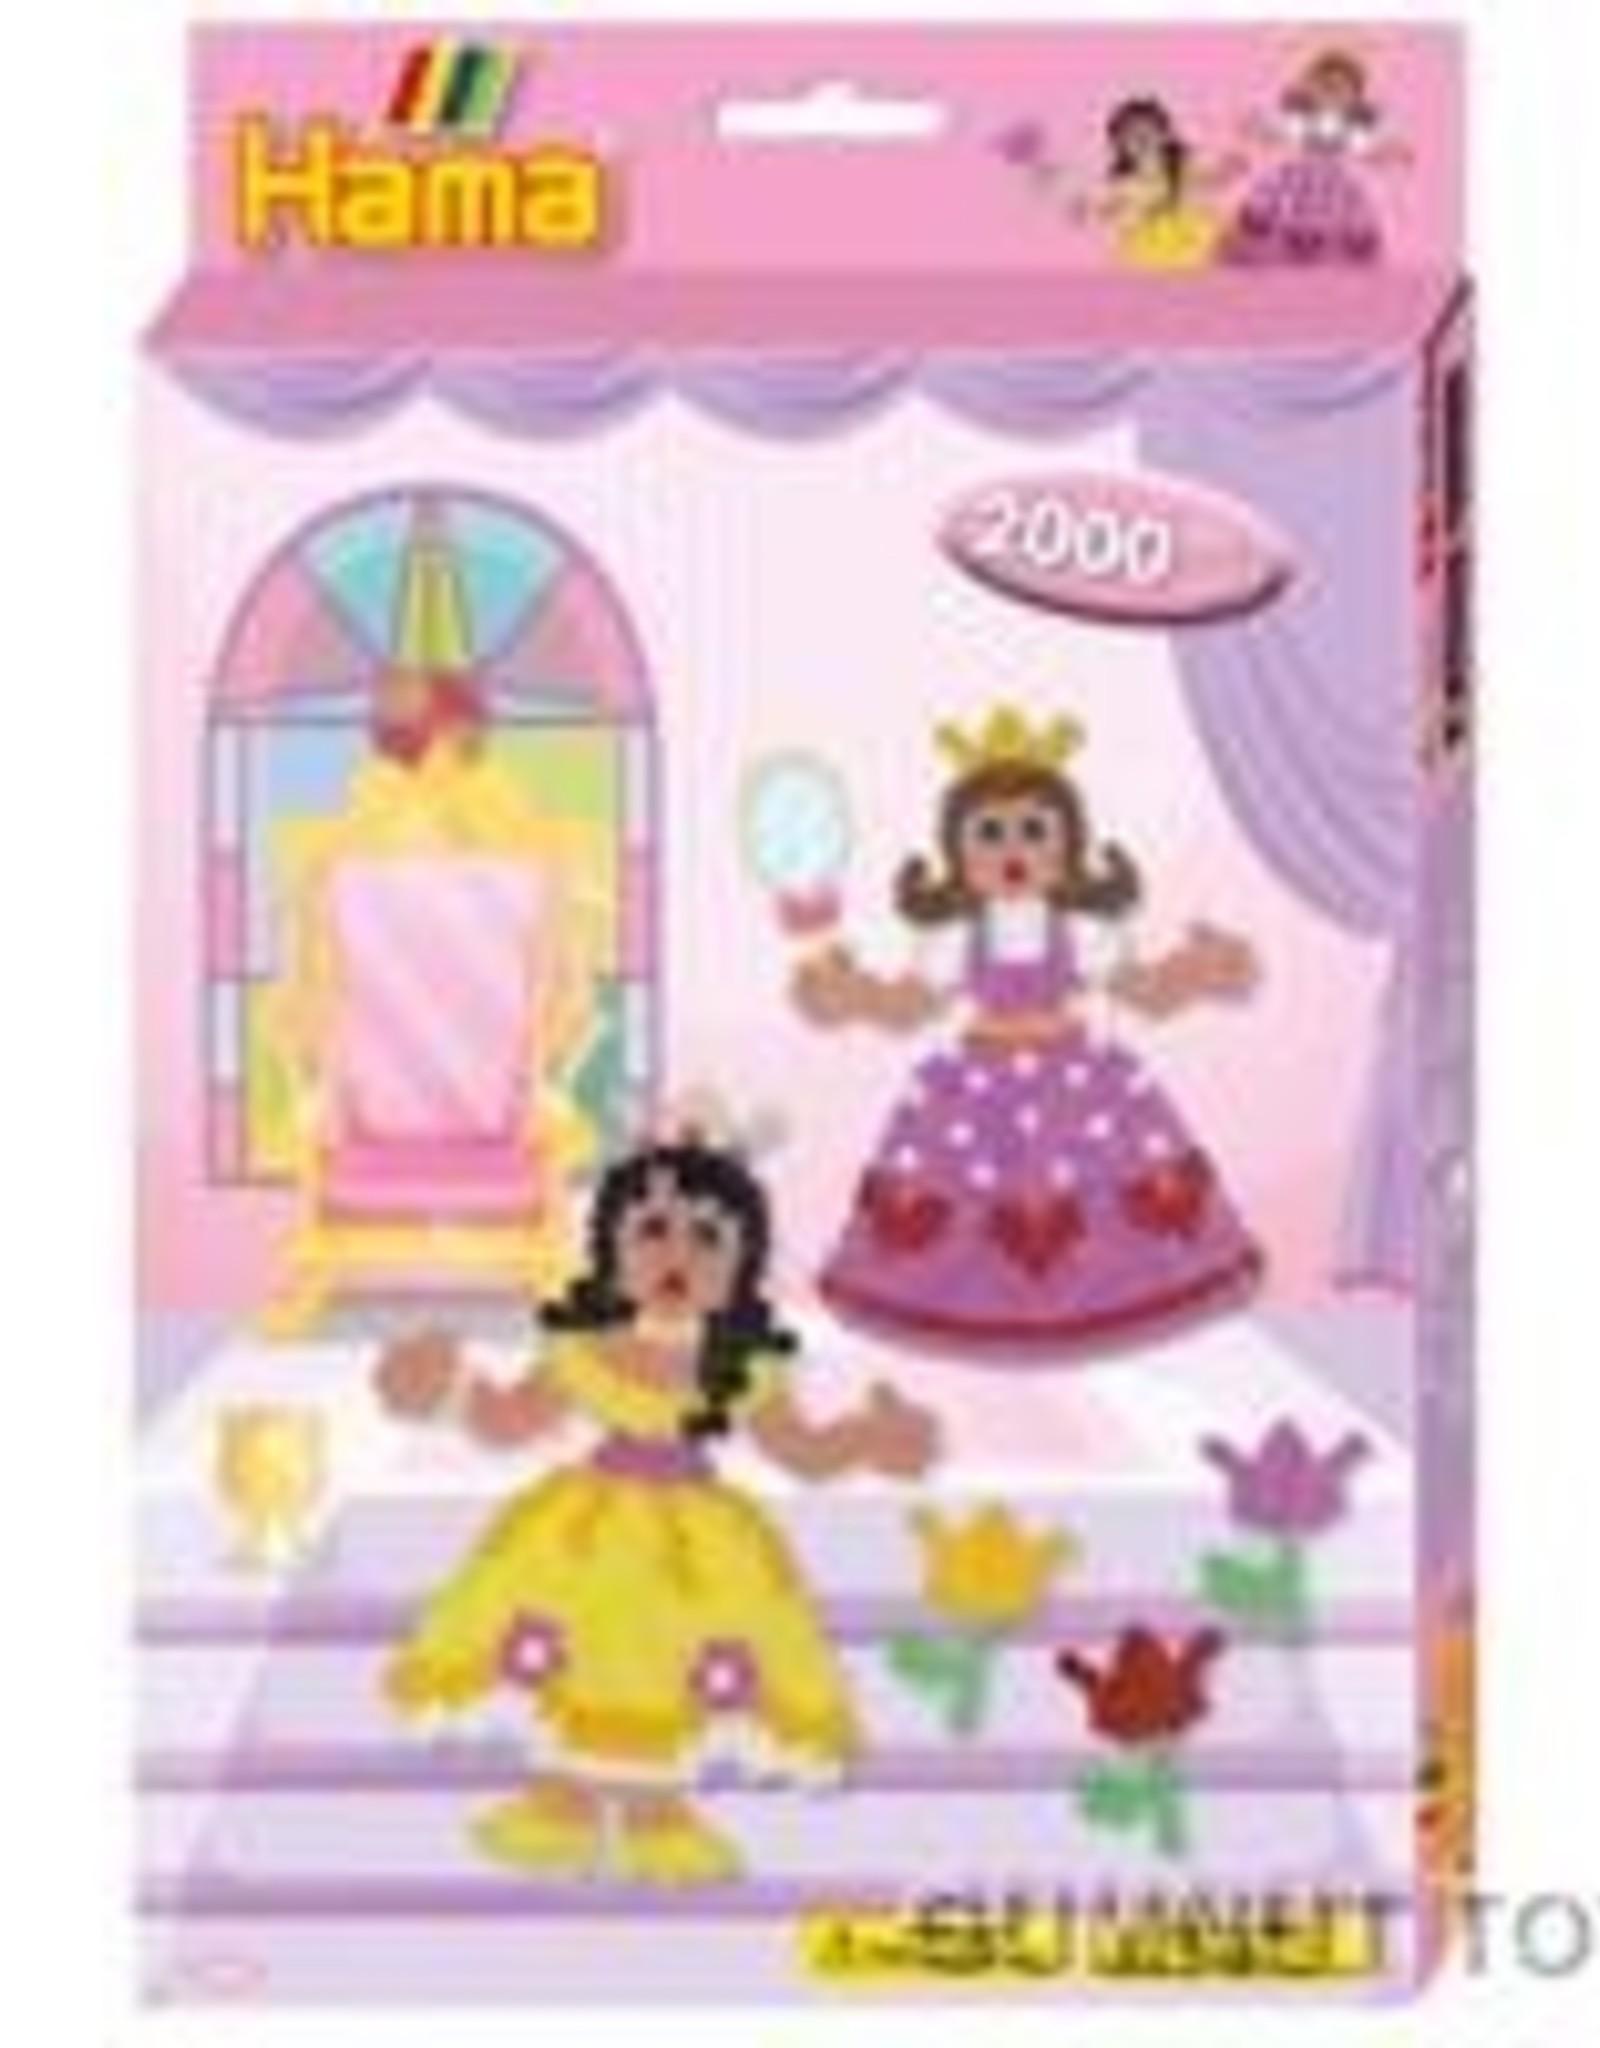 Hama Hama Bead Gift Box - Princess